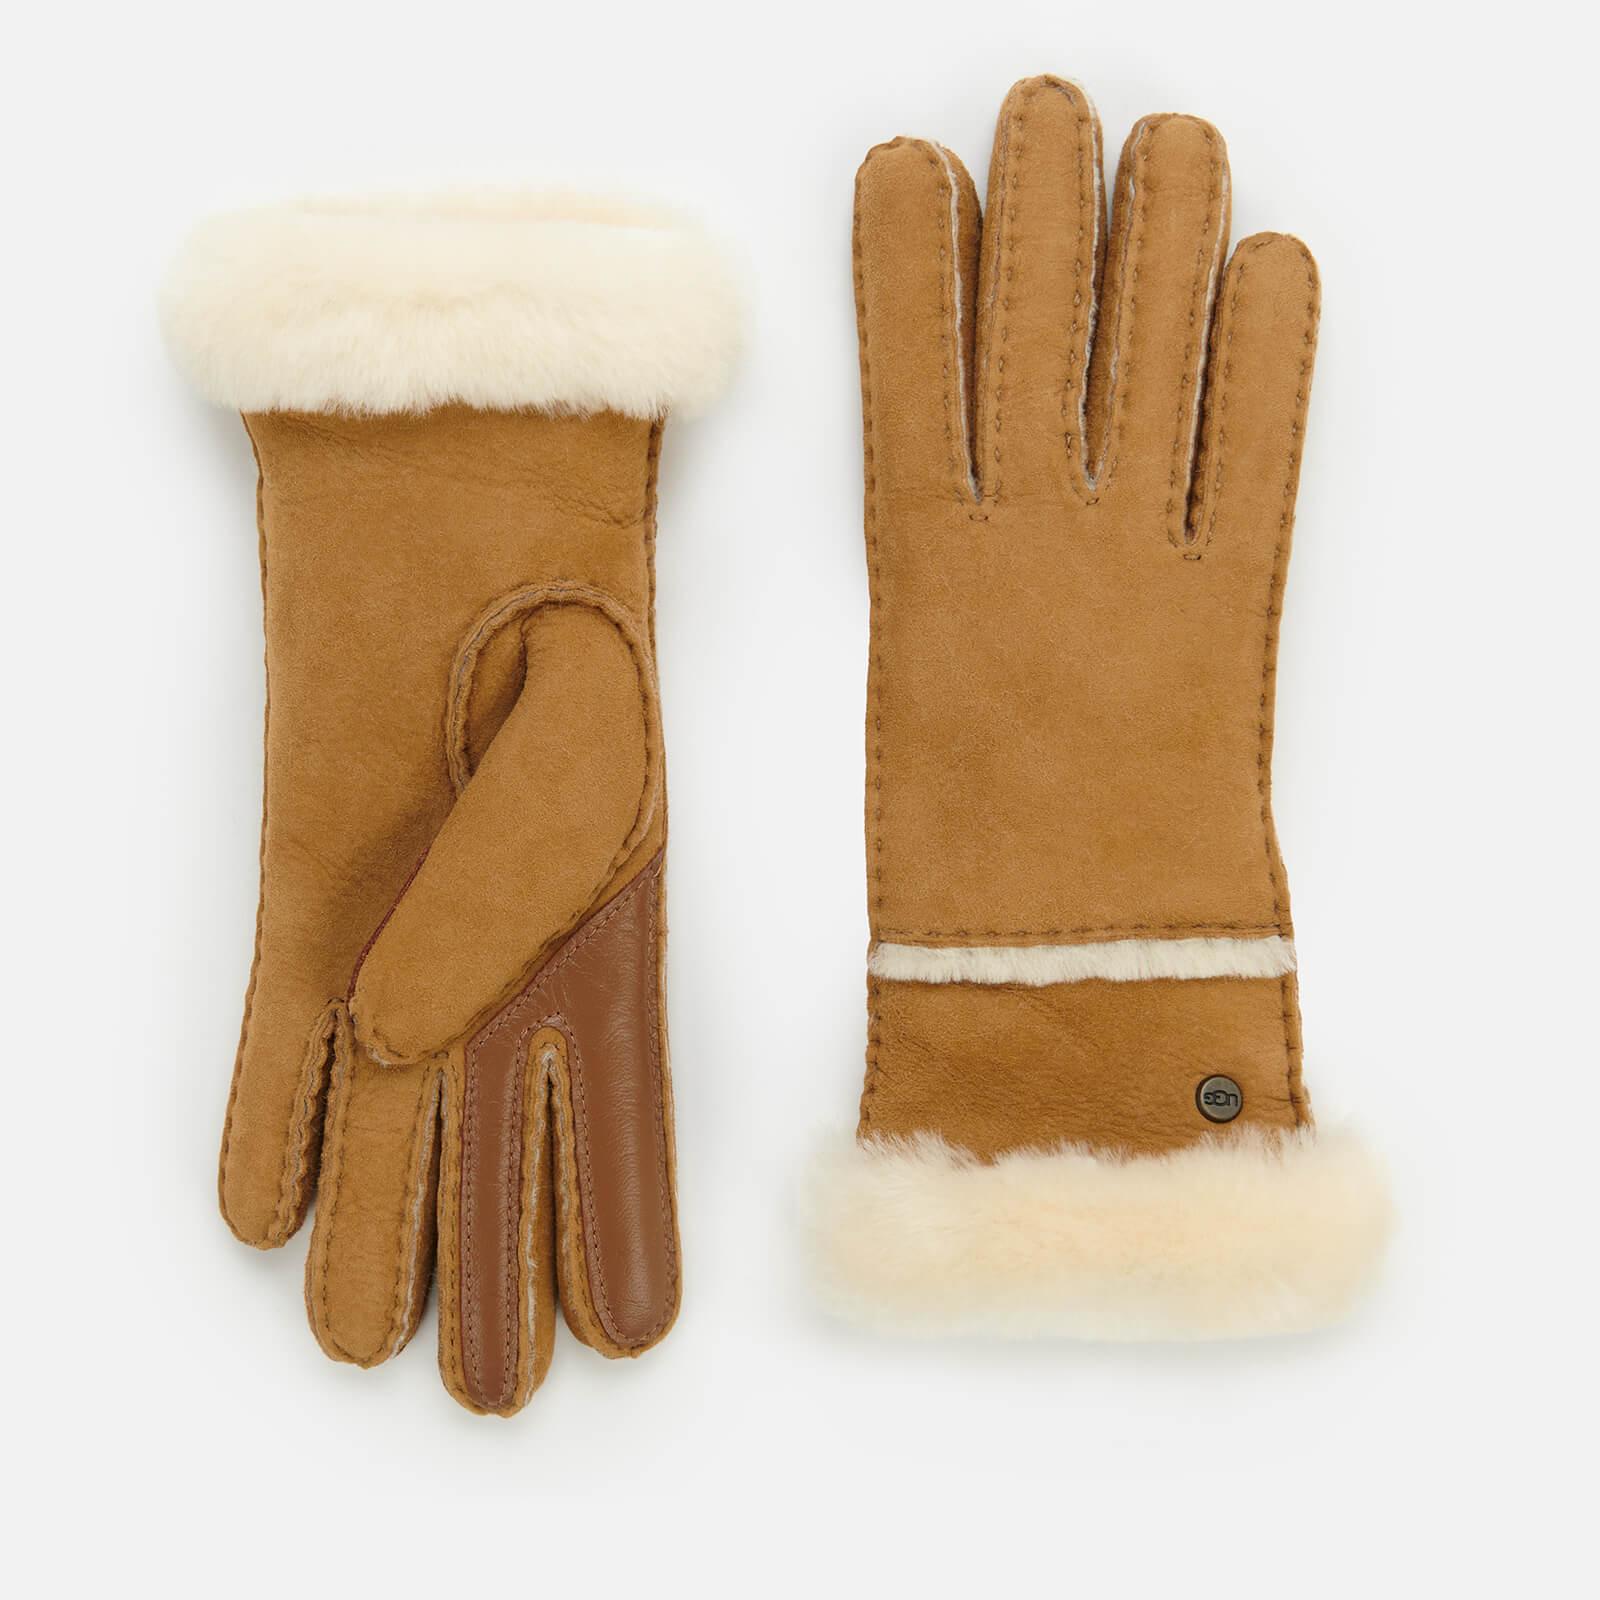 UGG Women's Seamed Tech Glove - Chestnut - M